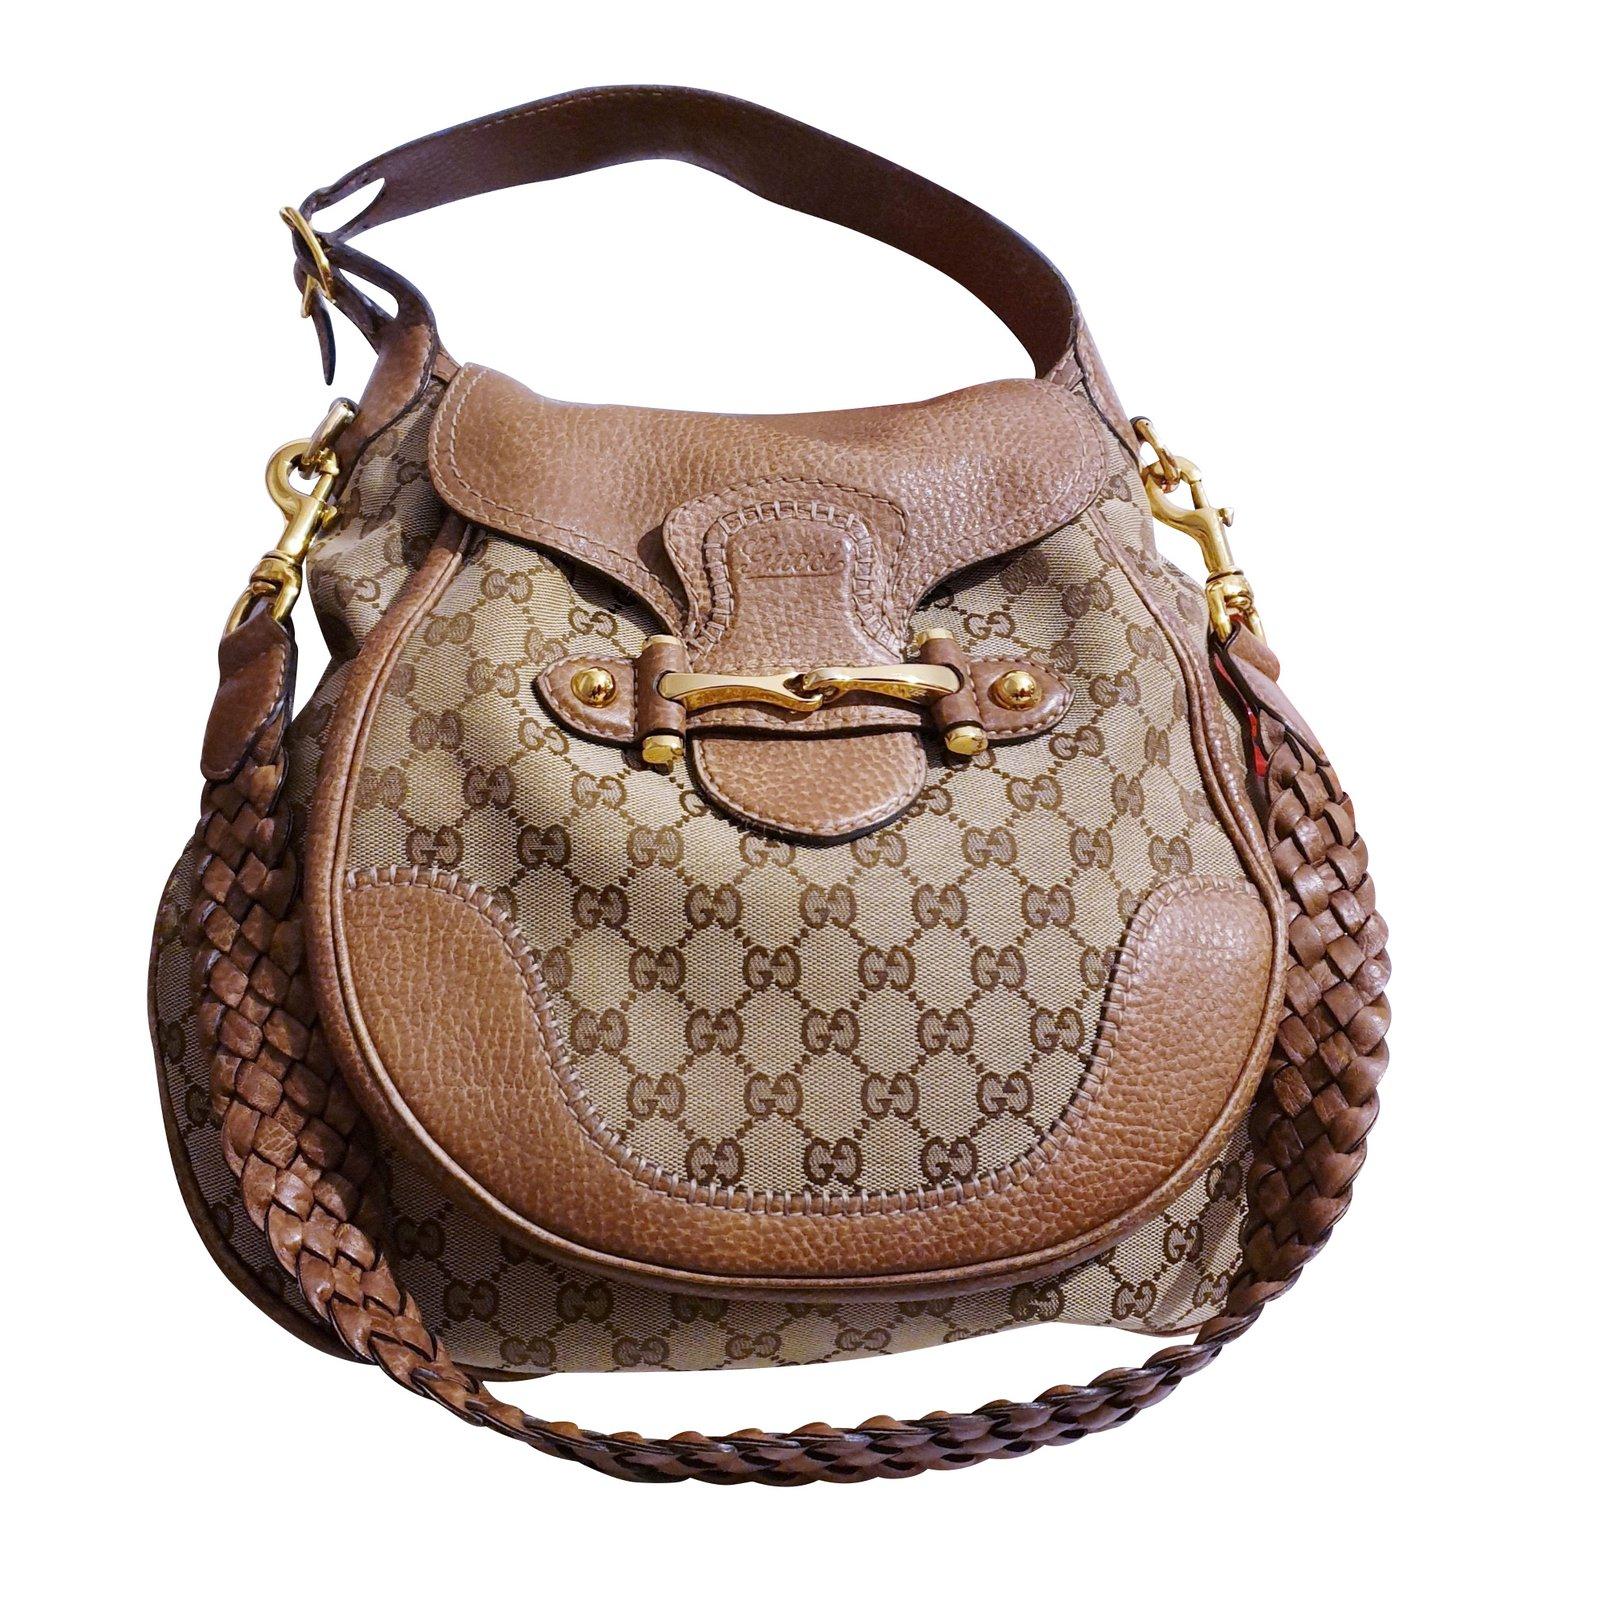 249a8a10bcf060 Gucci Gucci bag PELHAM shoulder strap Handbags Leather,Cloth Sand,Light  brown ref.